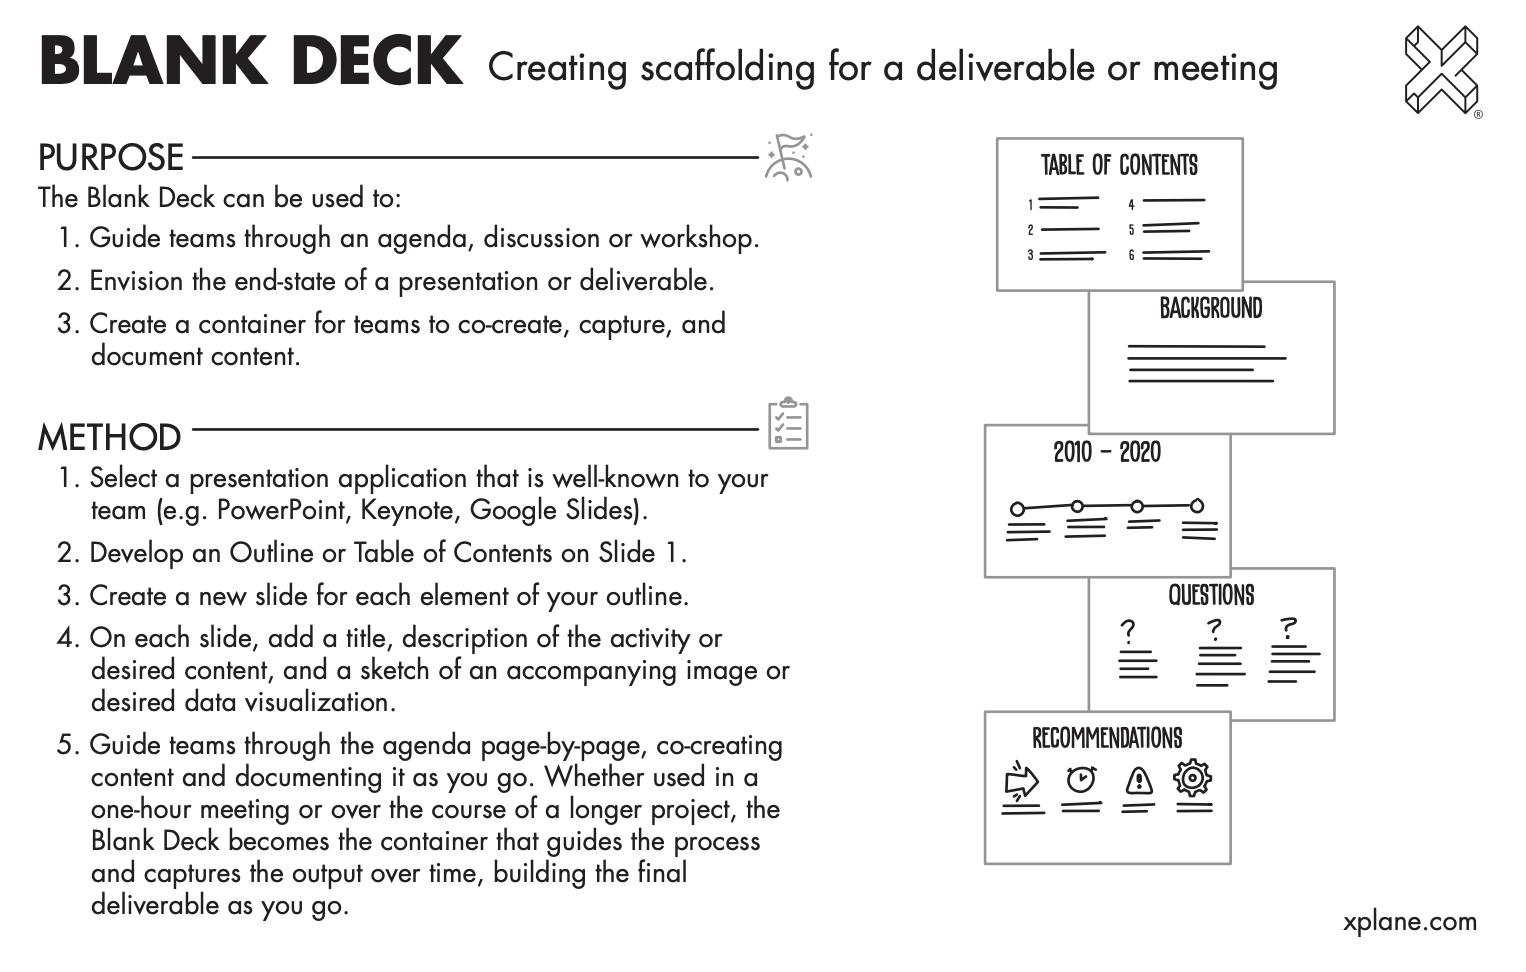 Blank Deck Method Card